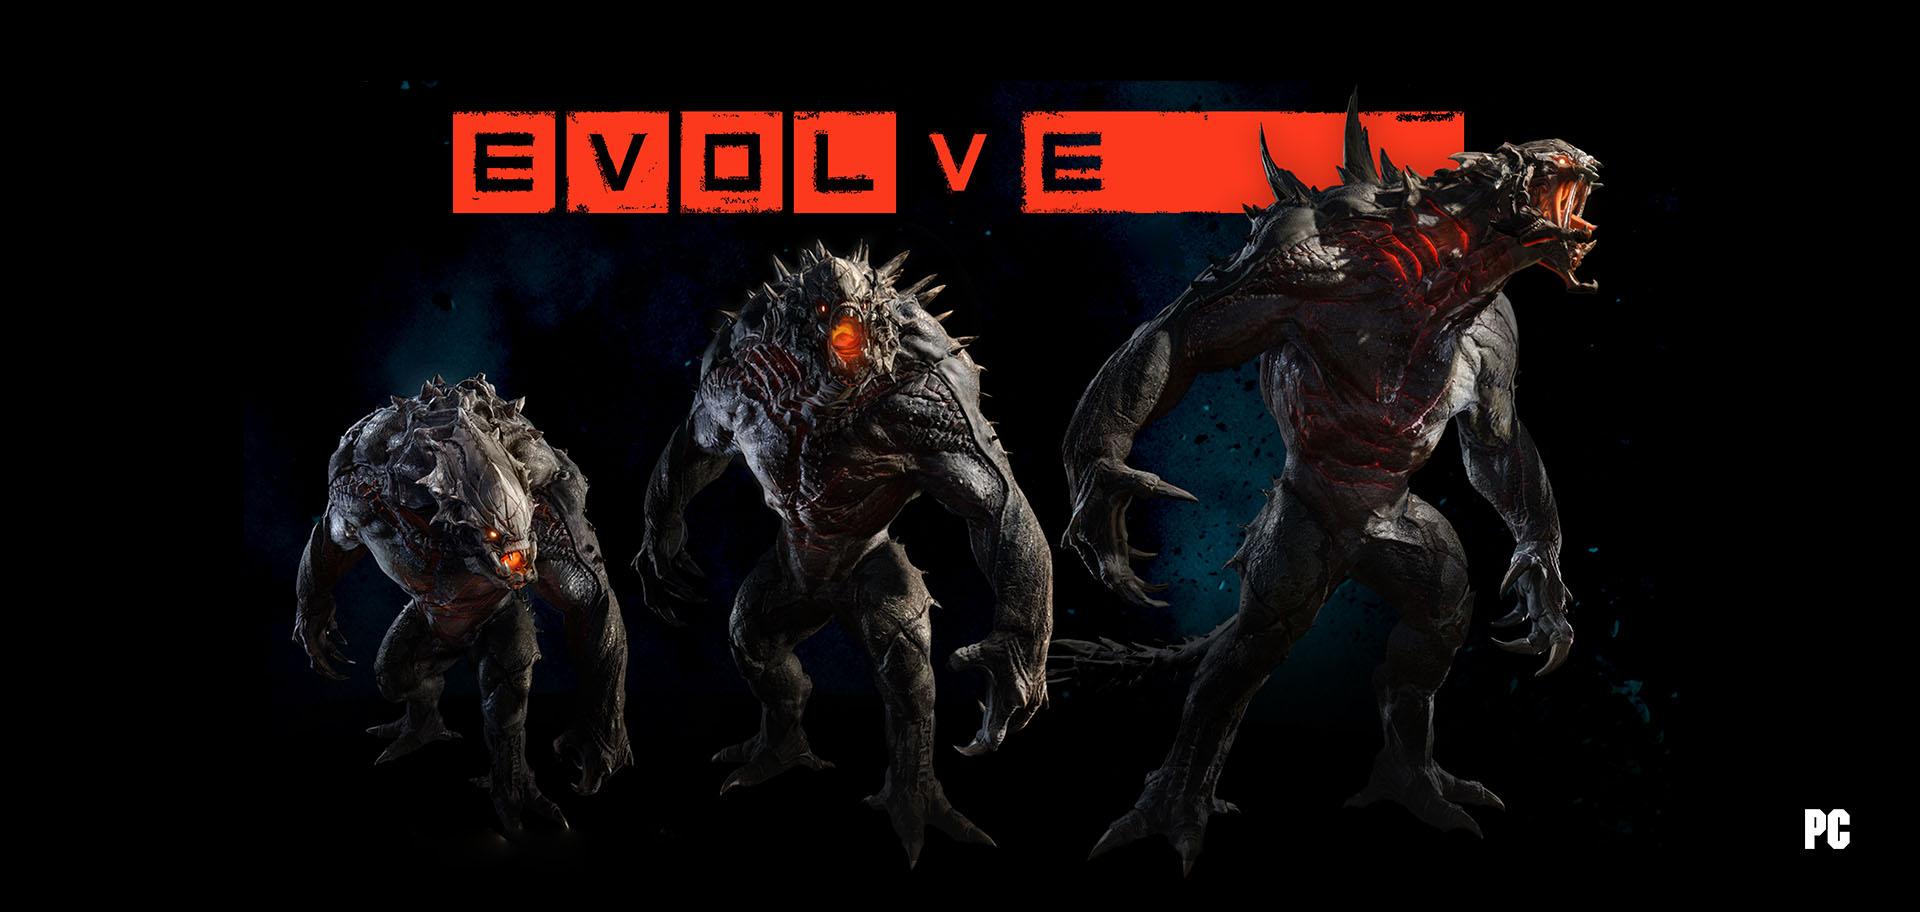 BSG1615_EVOLVE_PC